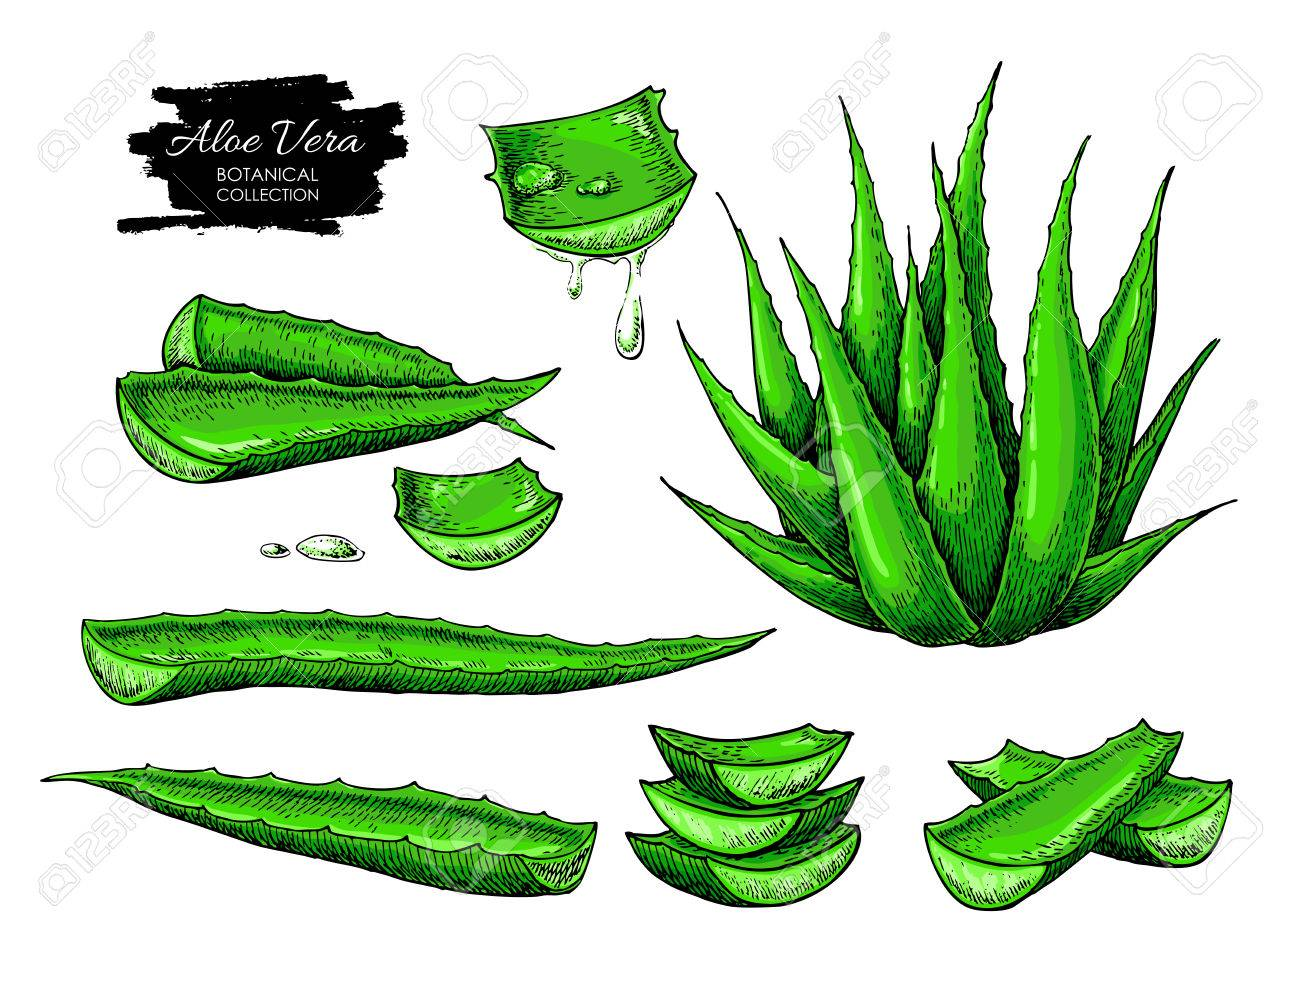 Aloe Vera Vector Illustration Set Hand Drawn Artistic Isolated